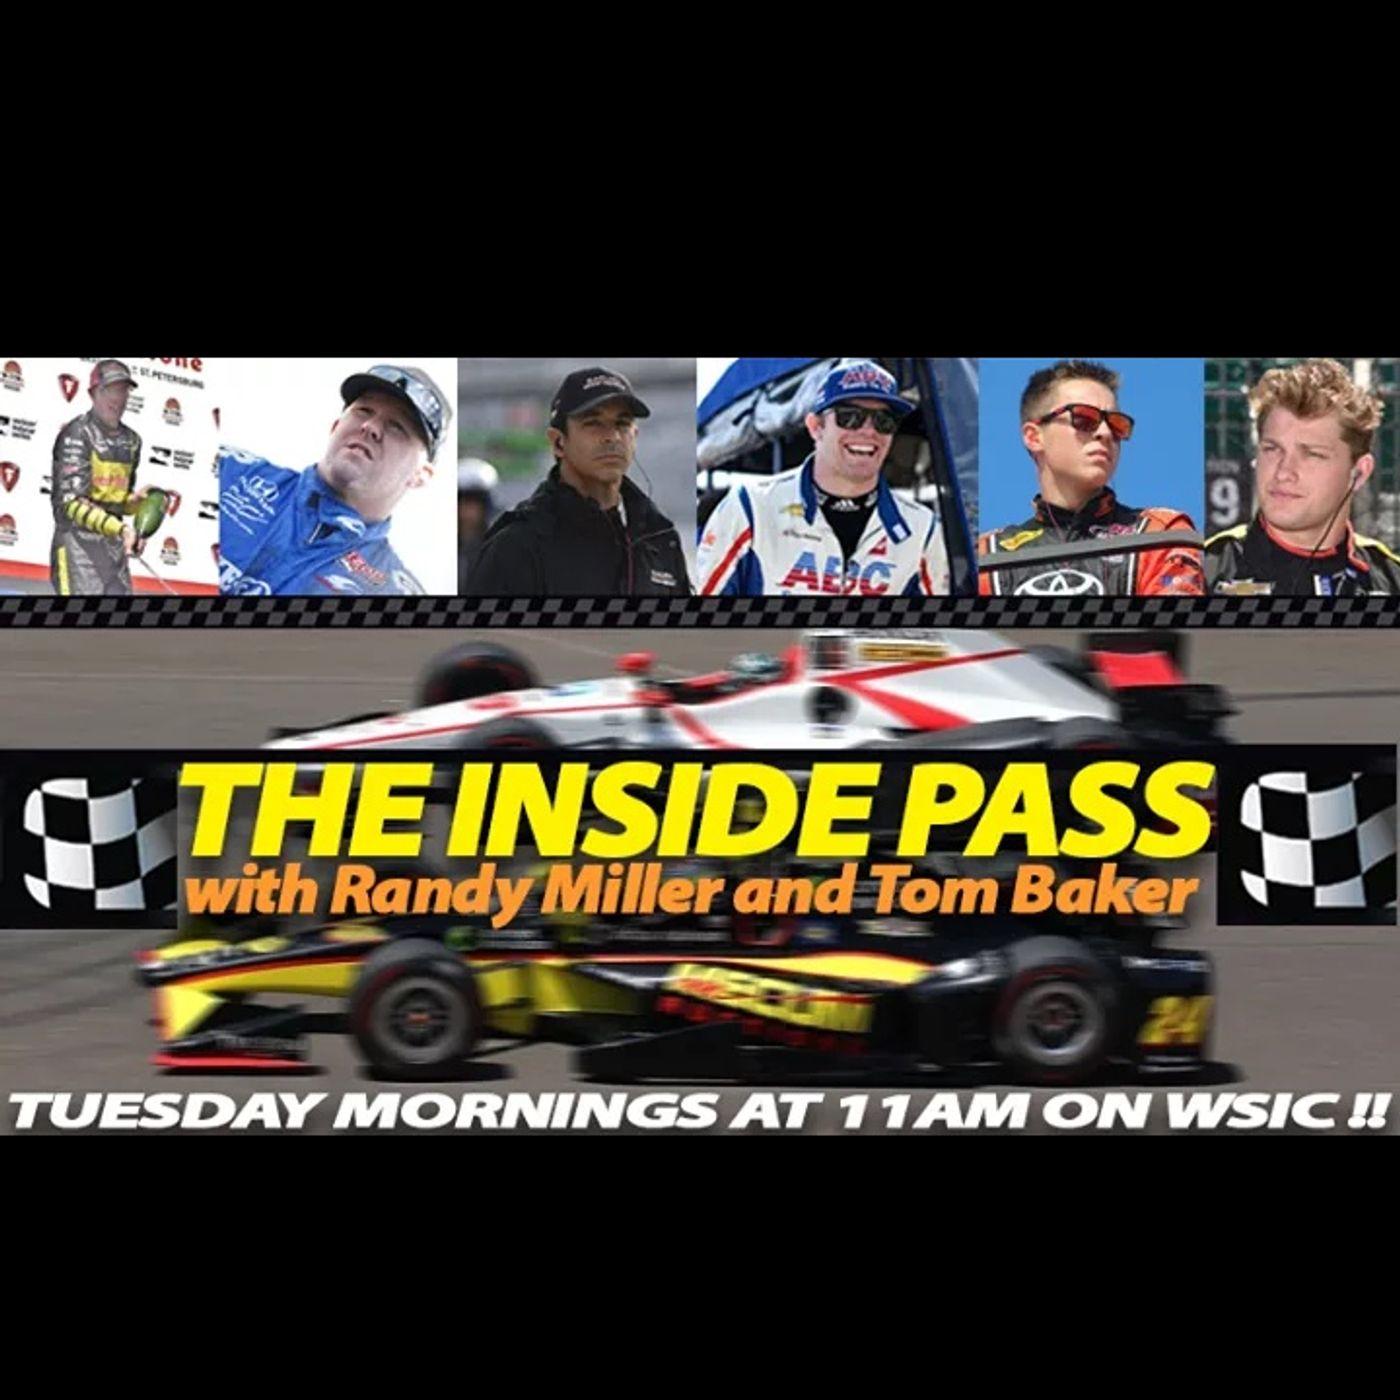 The Inside Pass